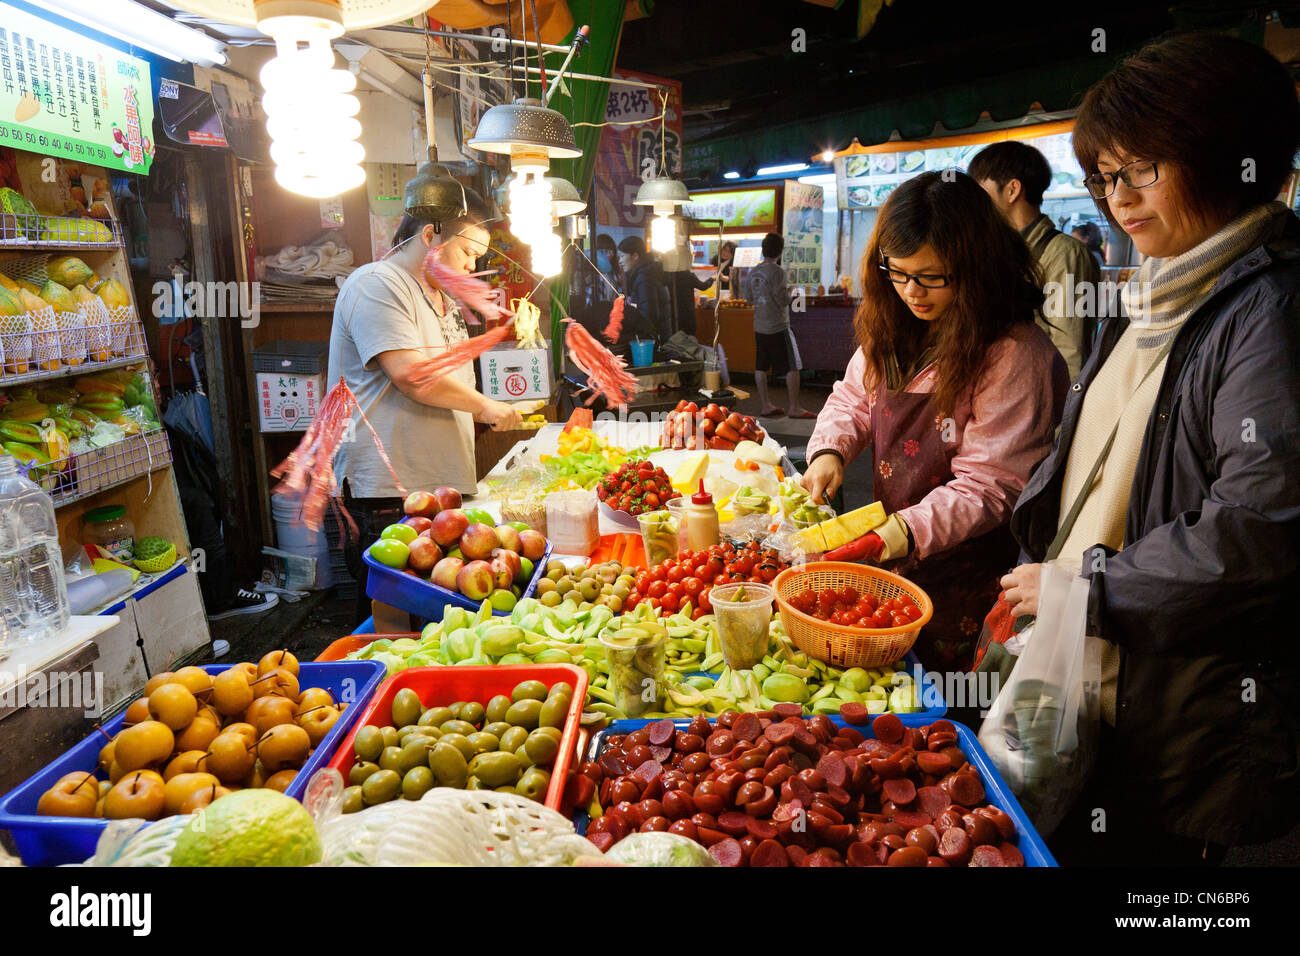 Shopping per i frutti di Shida Mercato Notturno, Taipei, Taiwan. JMH5639 Immagini Stock